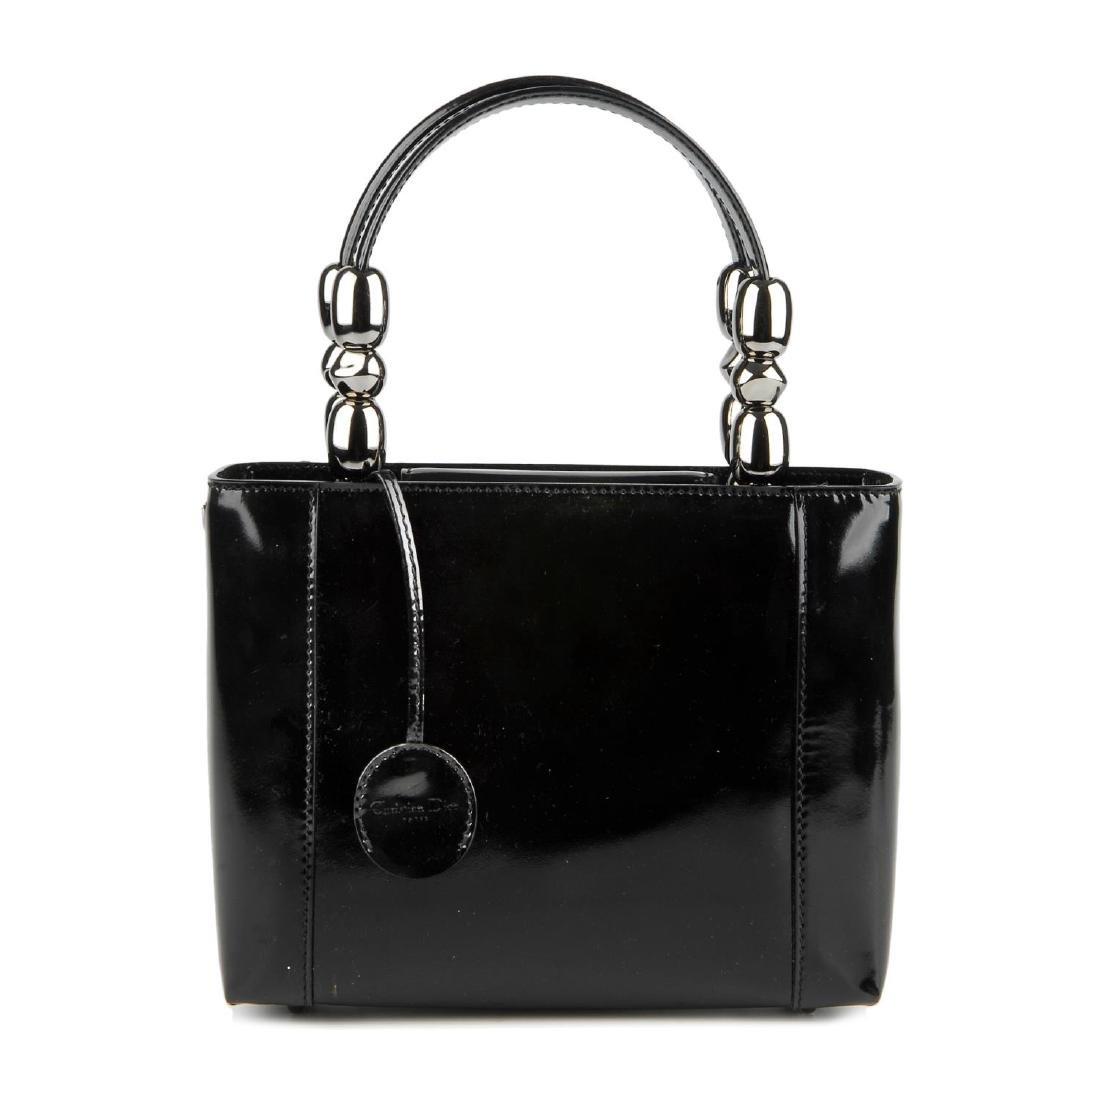 CHRISTIAN DIOR - a patent leather Malice handbag.